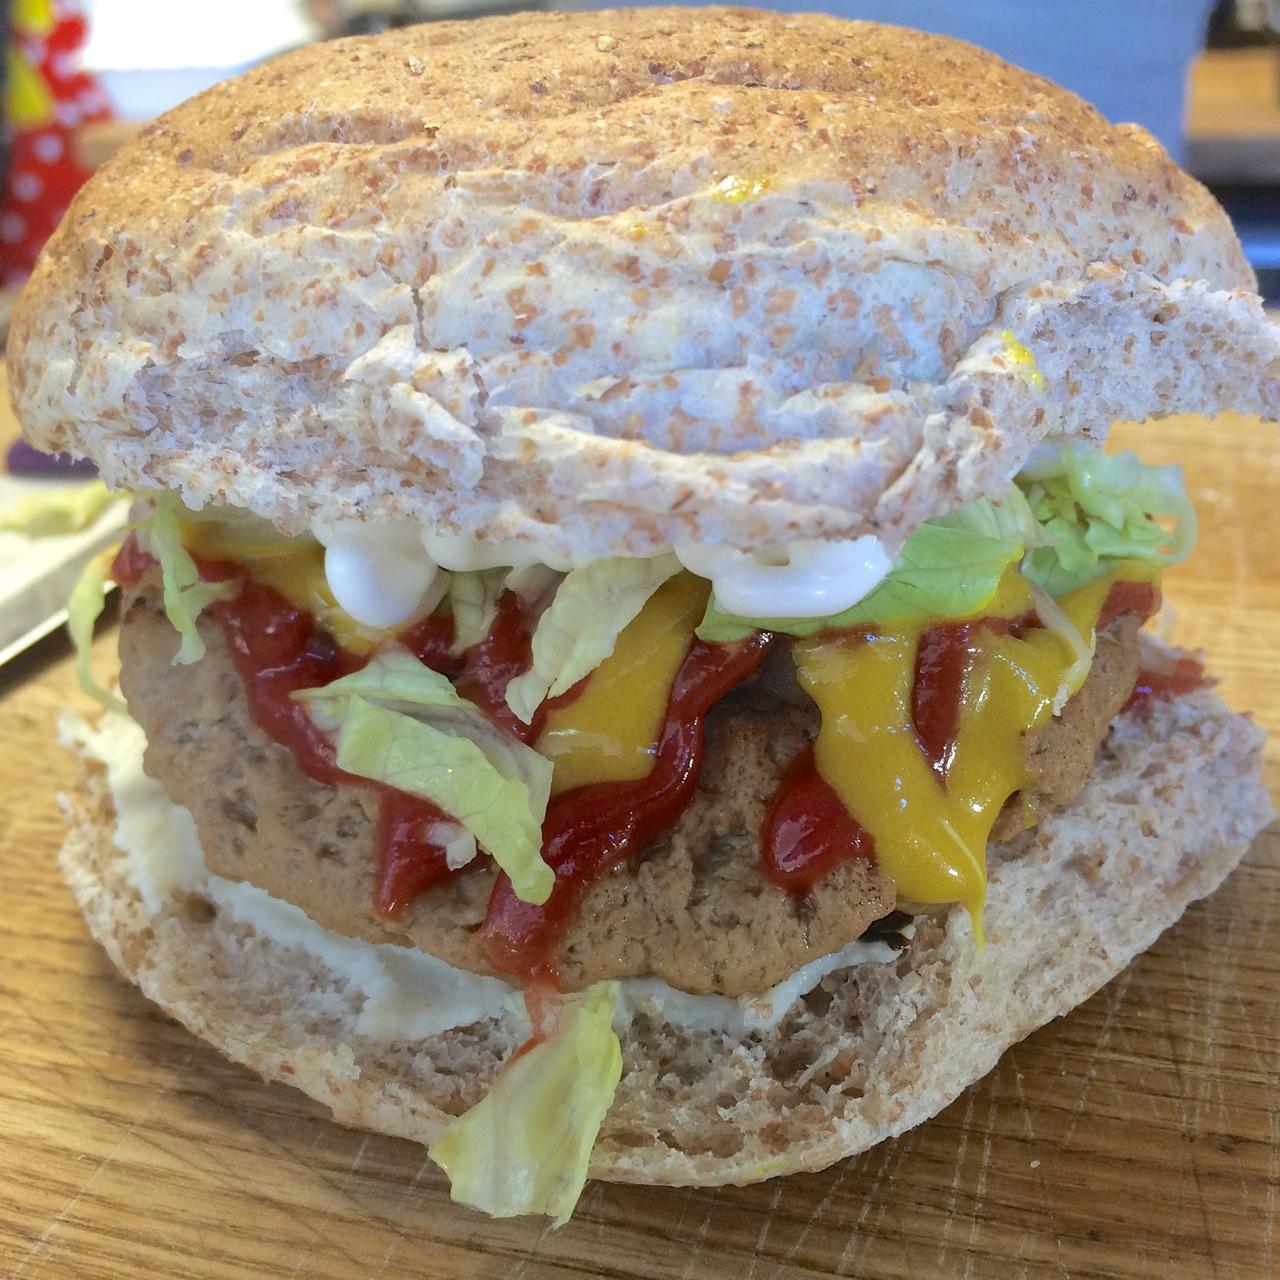 http://i0.wp.com/fatgayvegan.com/wp-content/uploads/2015/06/essential-vegan-burger-shoreditch-seitan.jpg?fit=1280%2C1280